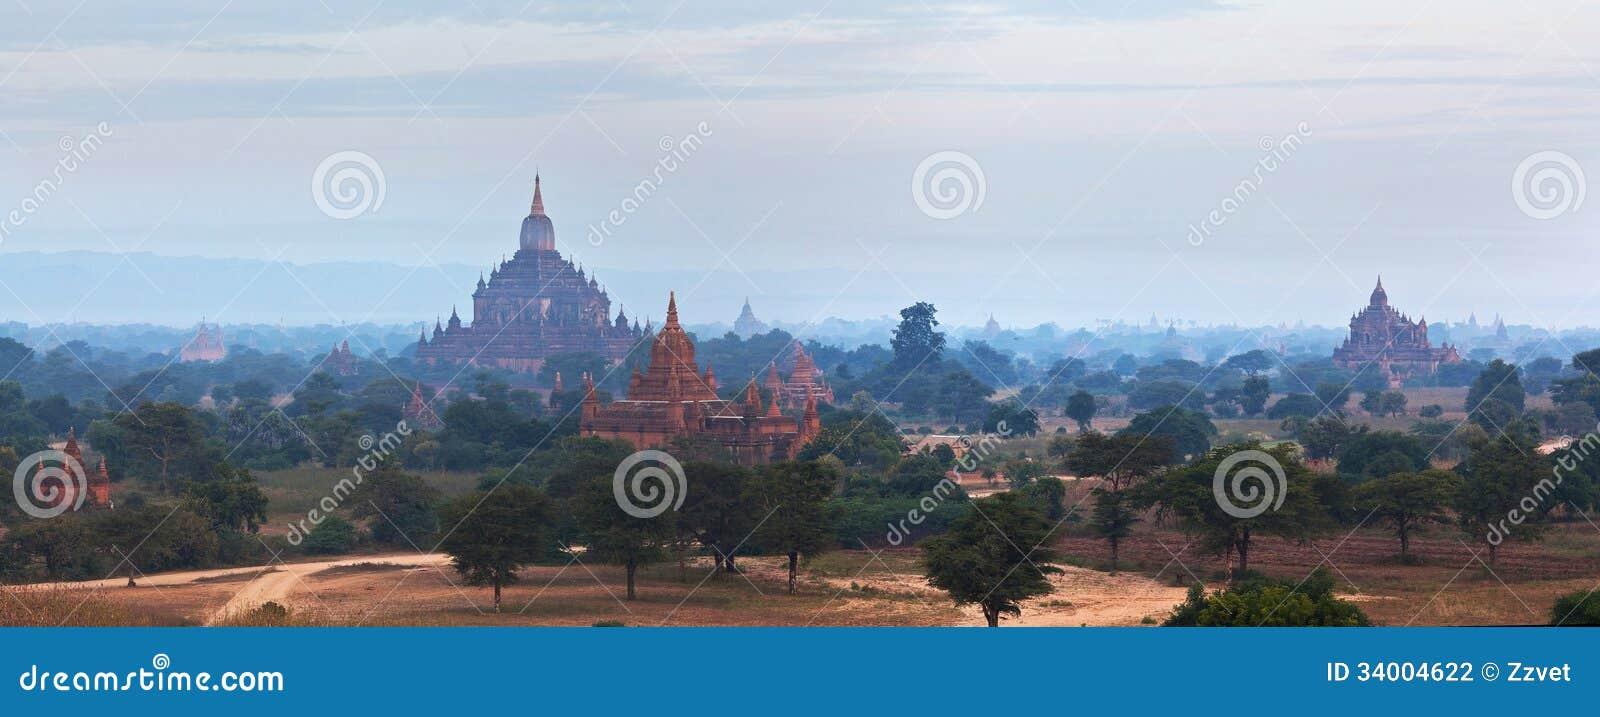 Bagan Archaeological Zone Myanmar